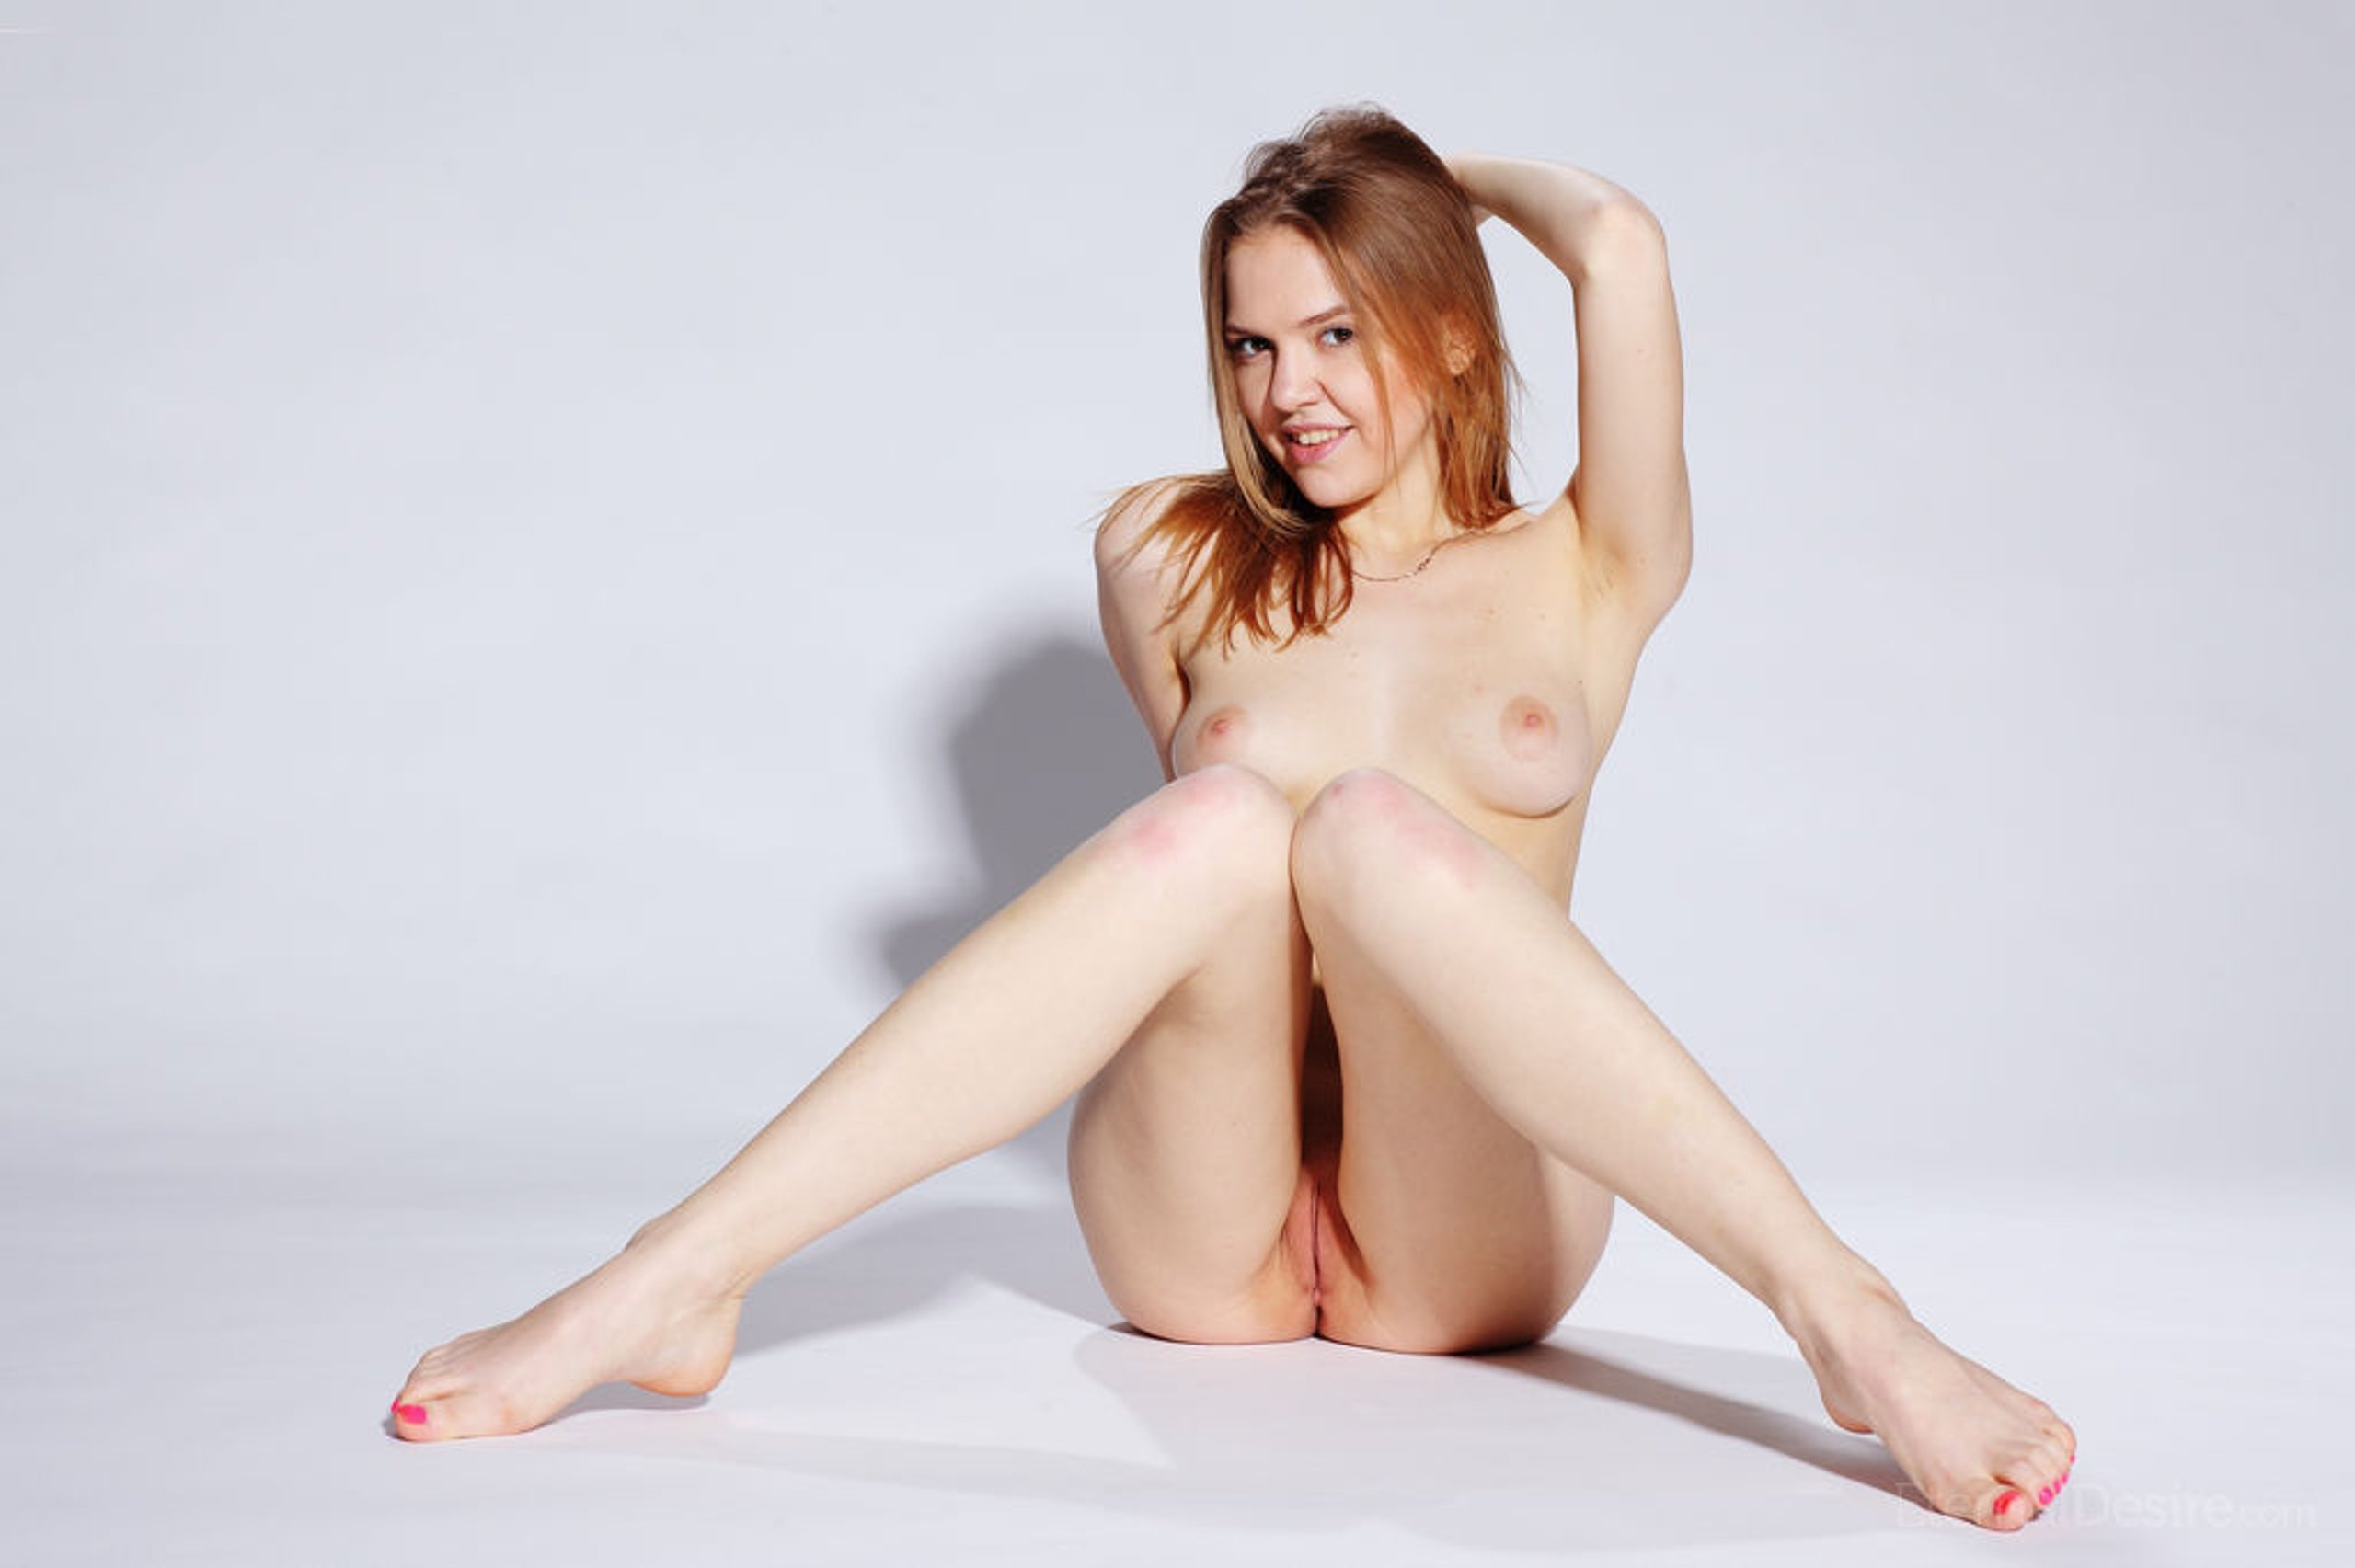 Her goddess delicious footjob gorgeous!